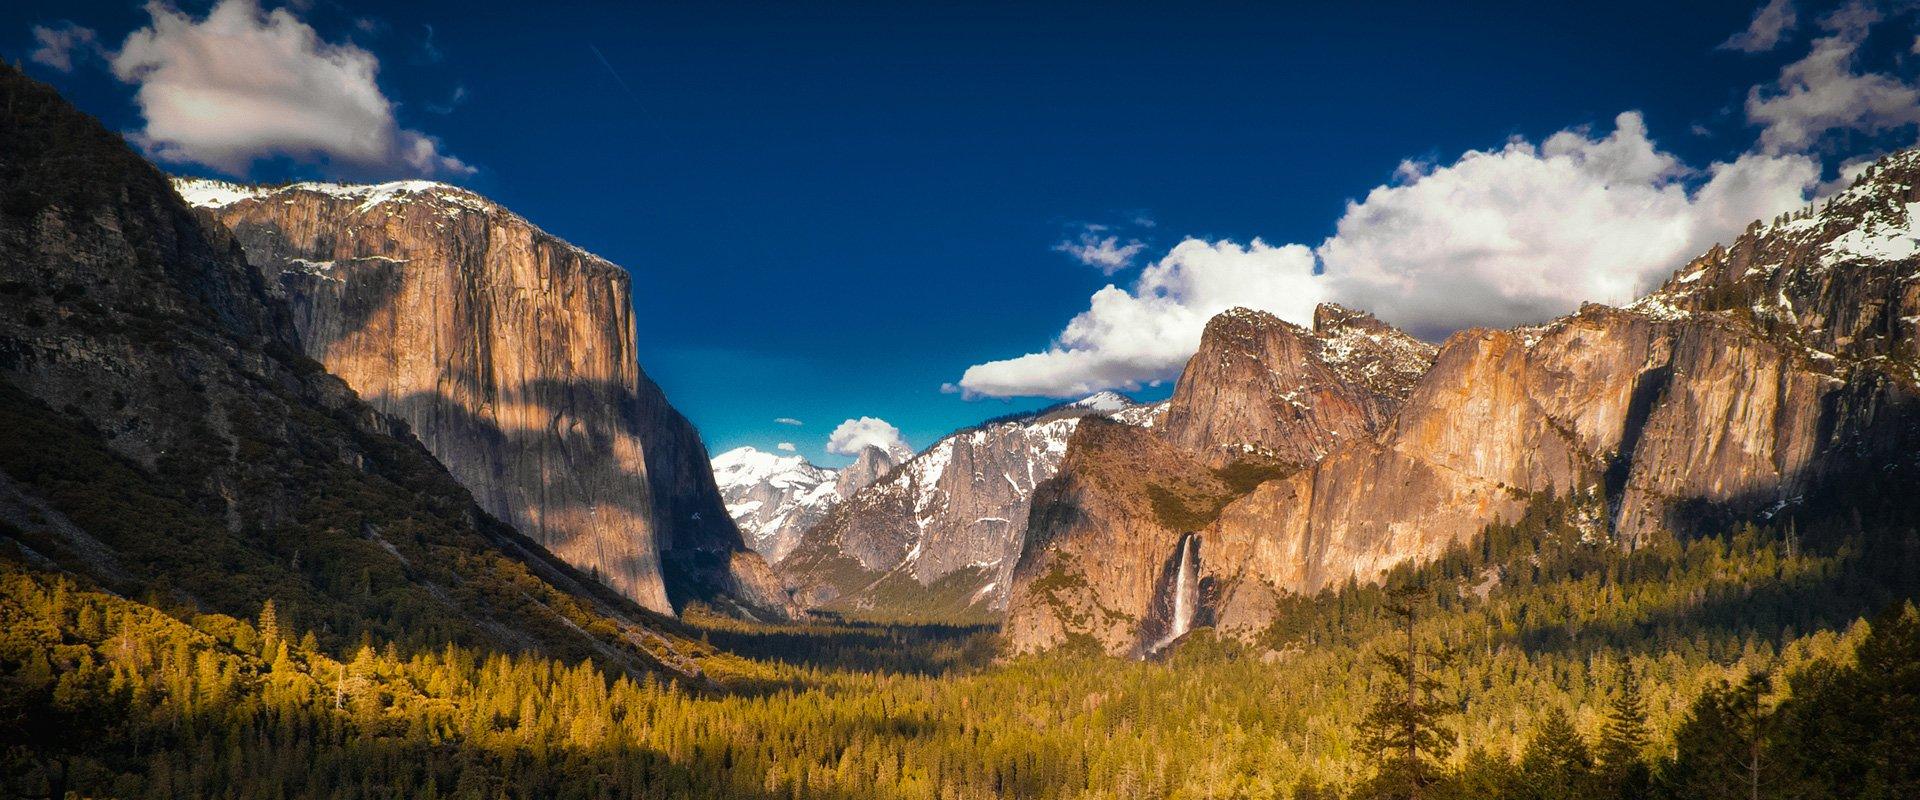 Тур по каньонам и национальным паркам